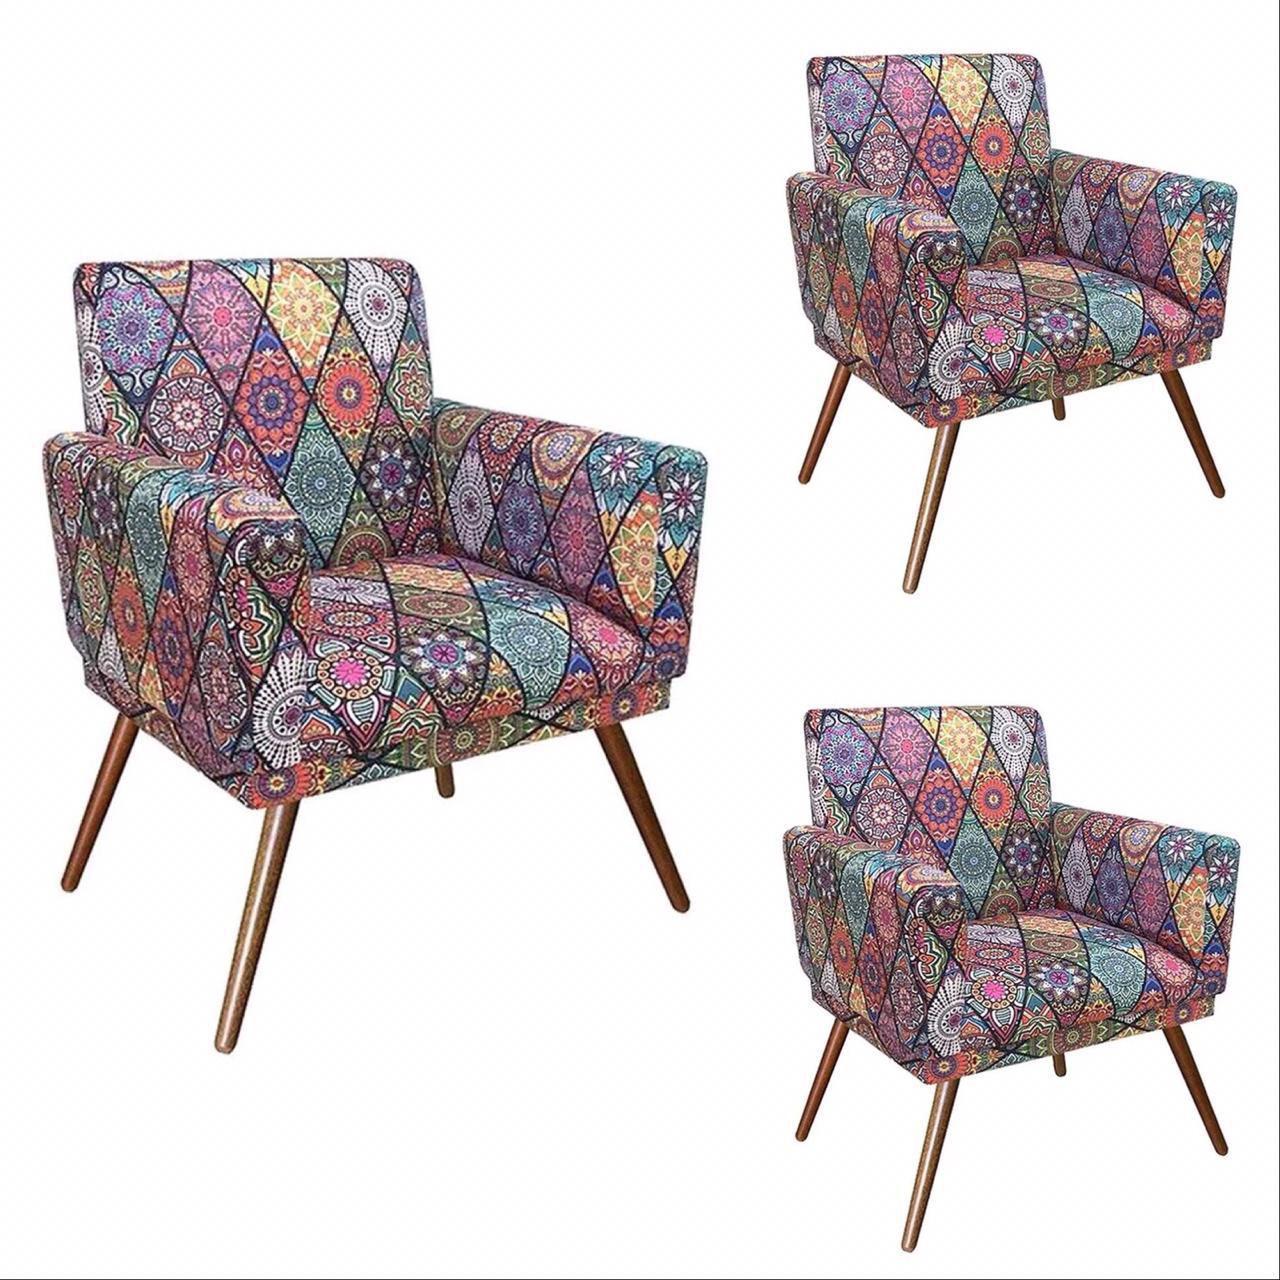 Kit 03 Poltrona Decorativa Nina com rodapé Mosaico- Bela Casa Shop